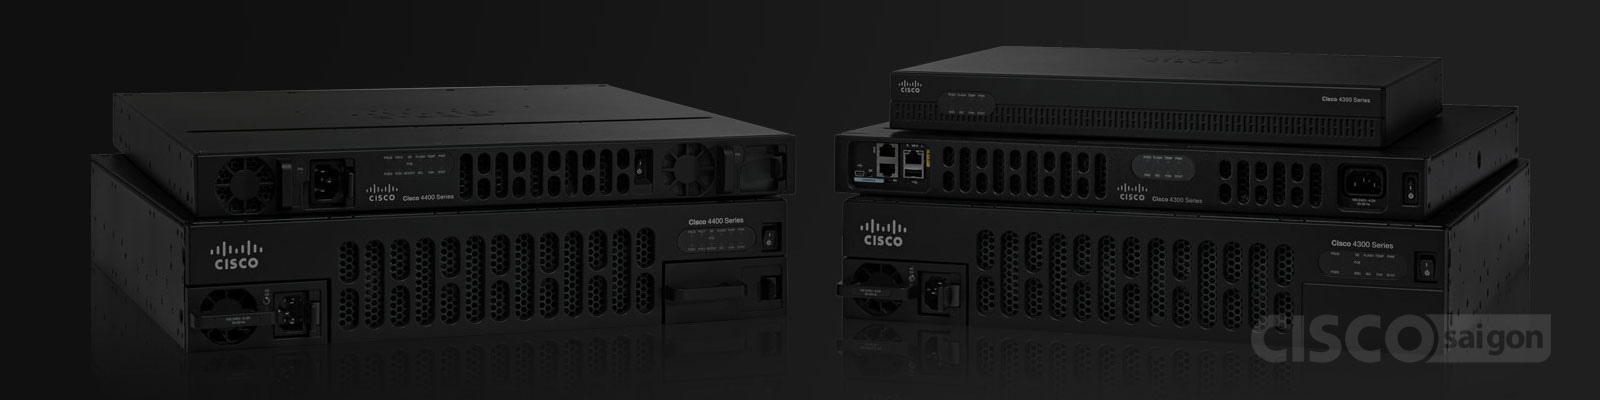 Router Cisco ISR4221/ ISR4321/ ISR4331/ ISR4351/ ISR4431/ ISR4451 chính hãng